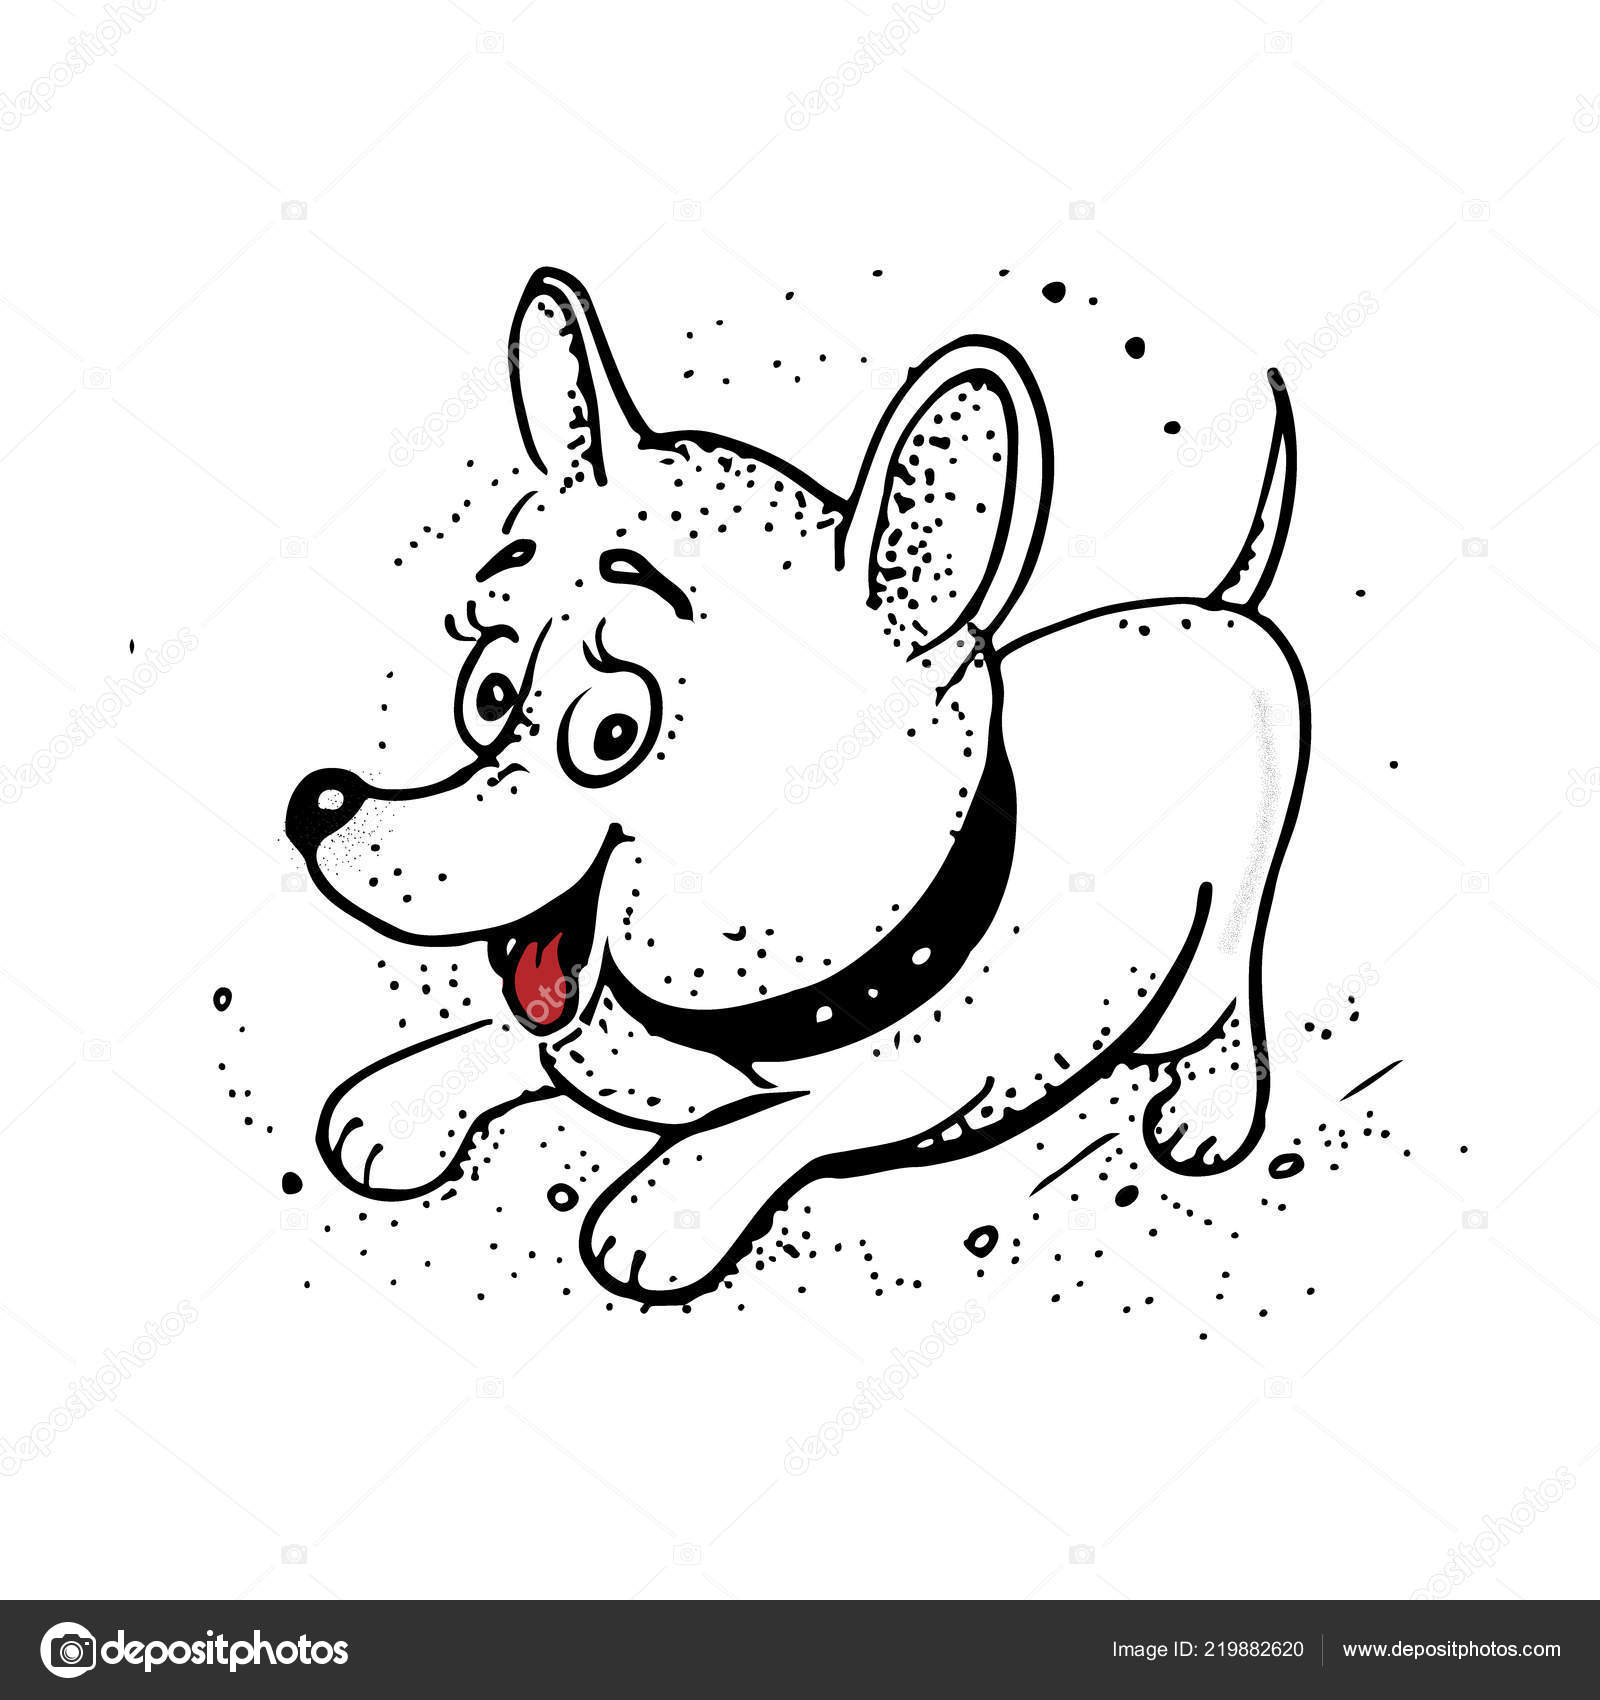 Legracni Karikatura Psa Rucni Kresba Izolovane Objekty Na Bilem